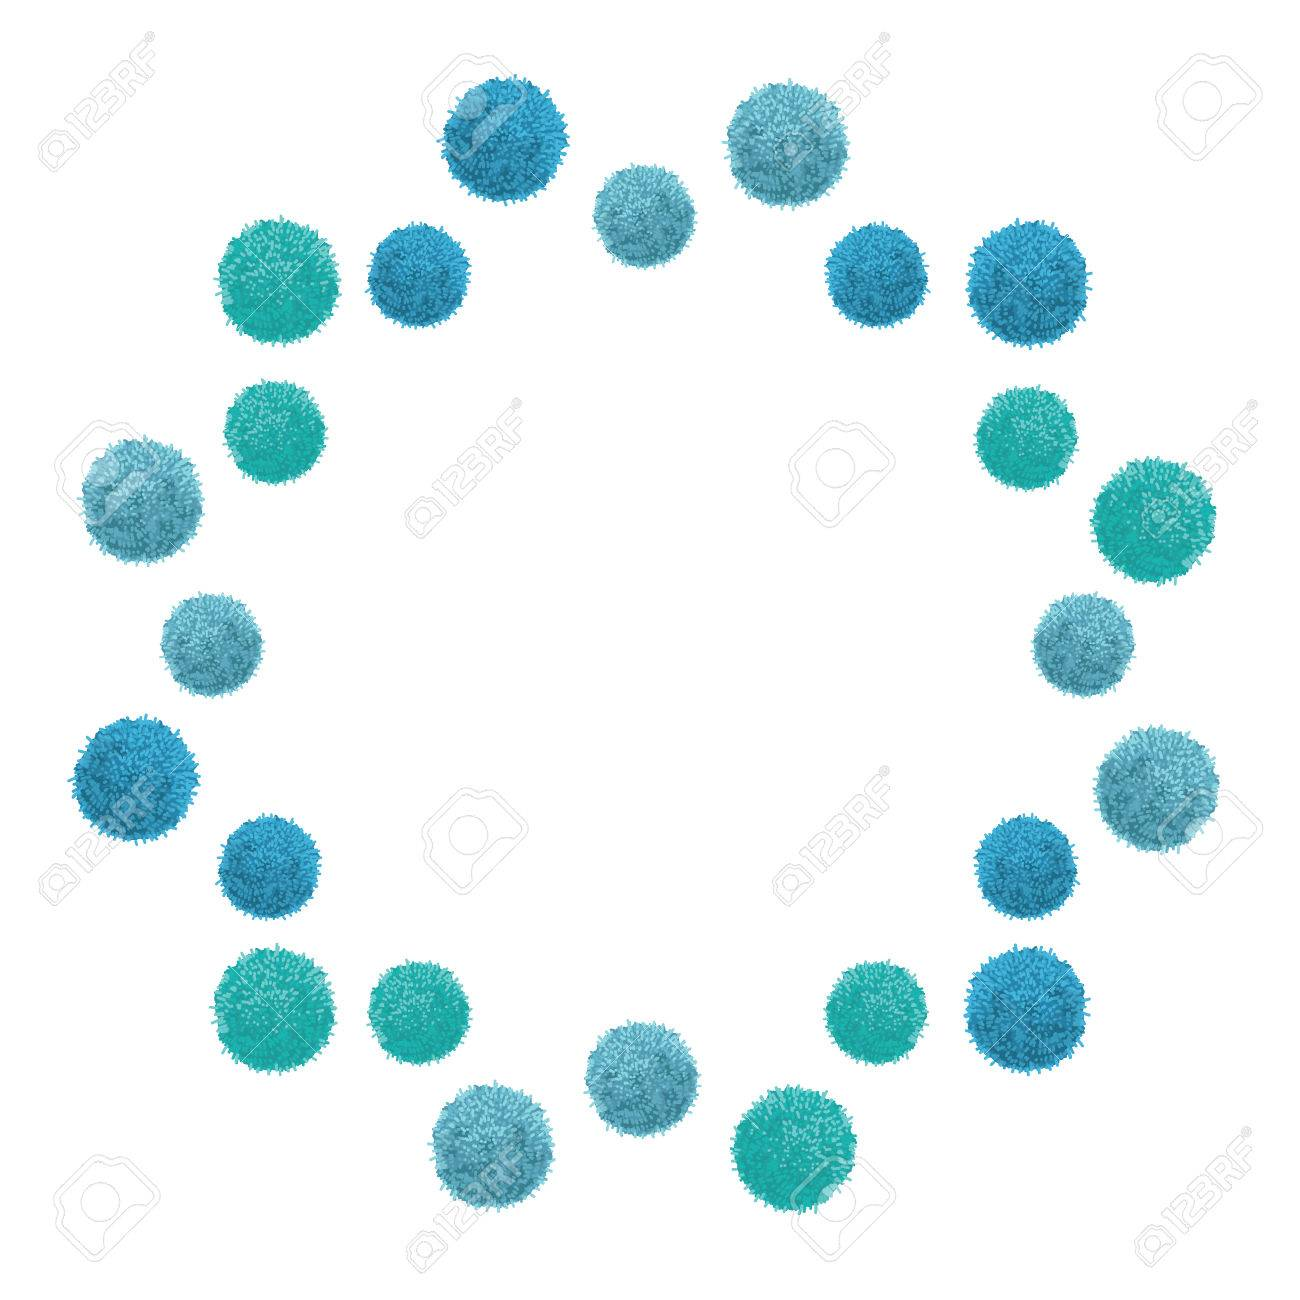 Vector Baby Boy Blue Birthday Party Pom Poms Floating Circle